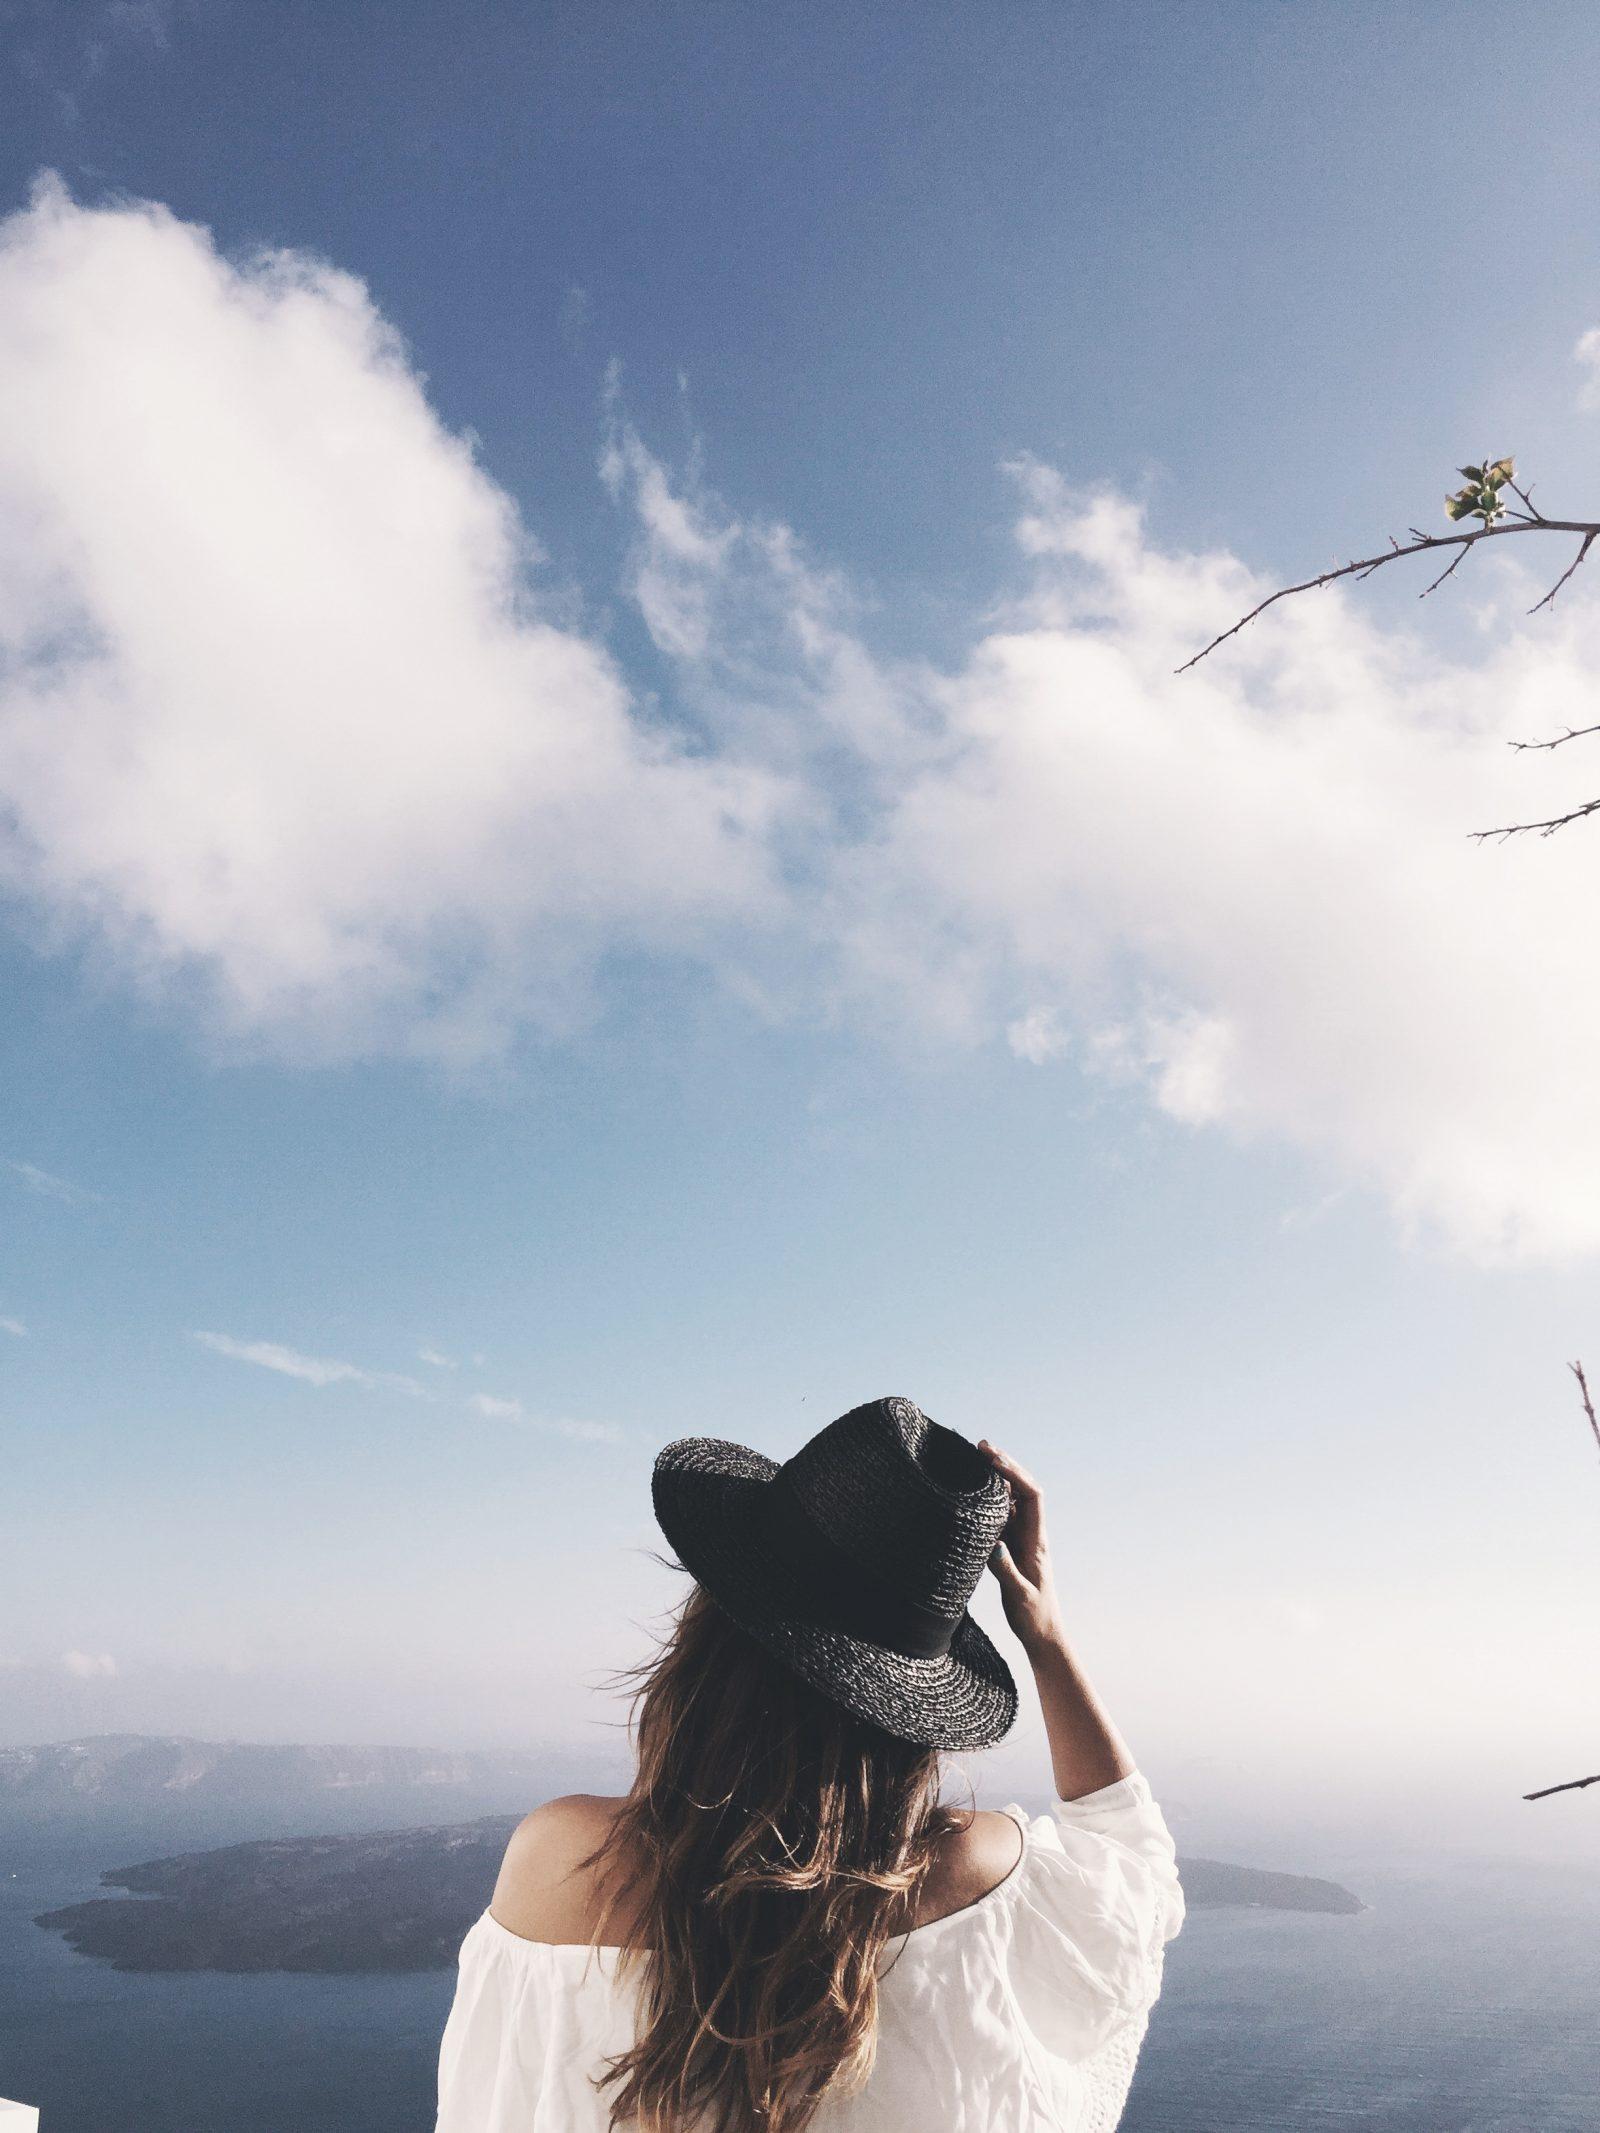 Scarf_As_Skirt_Boho_Top-Straw_Hat-Soludos_Escapes-Soludos_Espadrilles-Summer-Santorini-Collage_Vintage-53